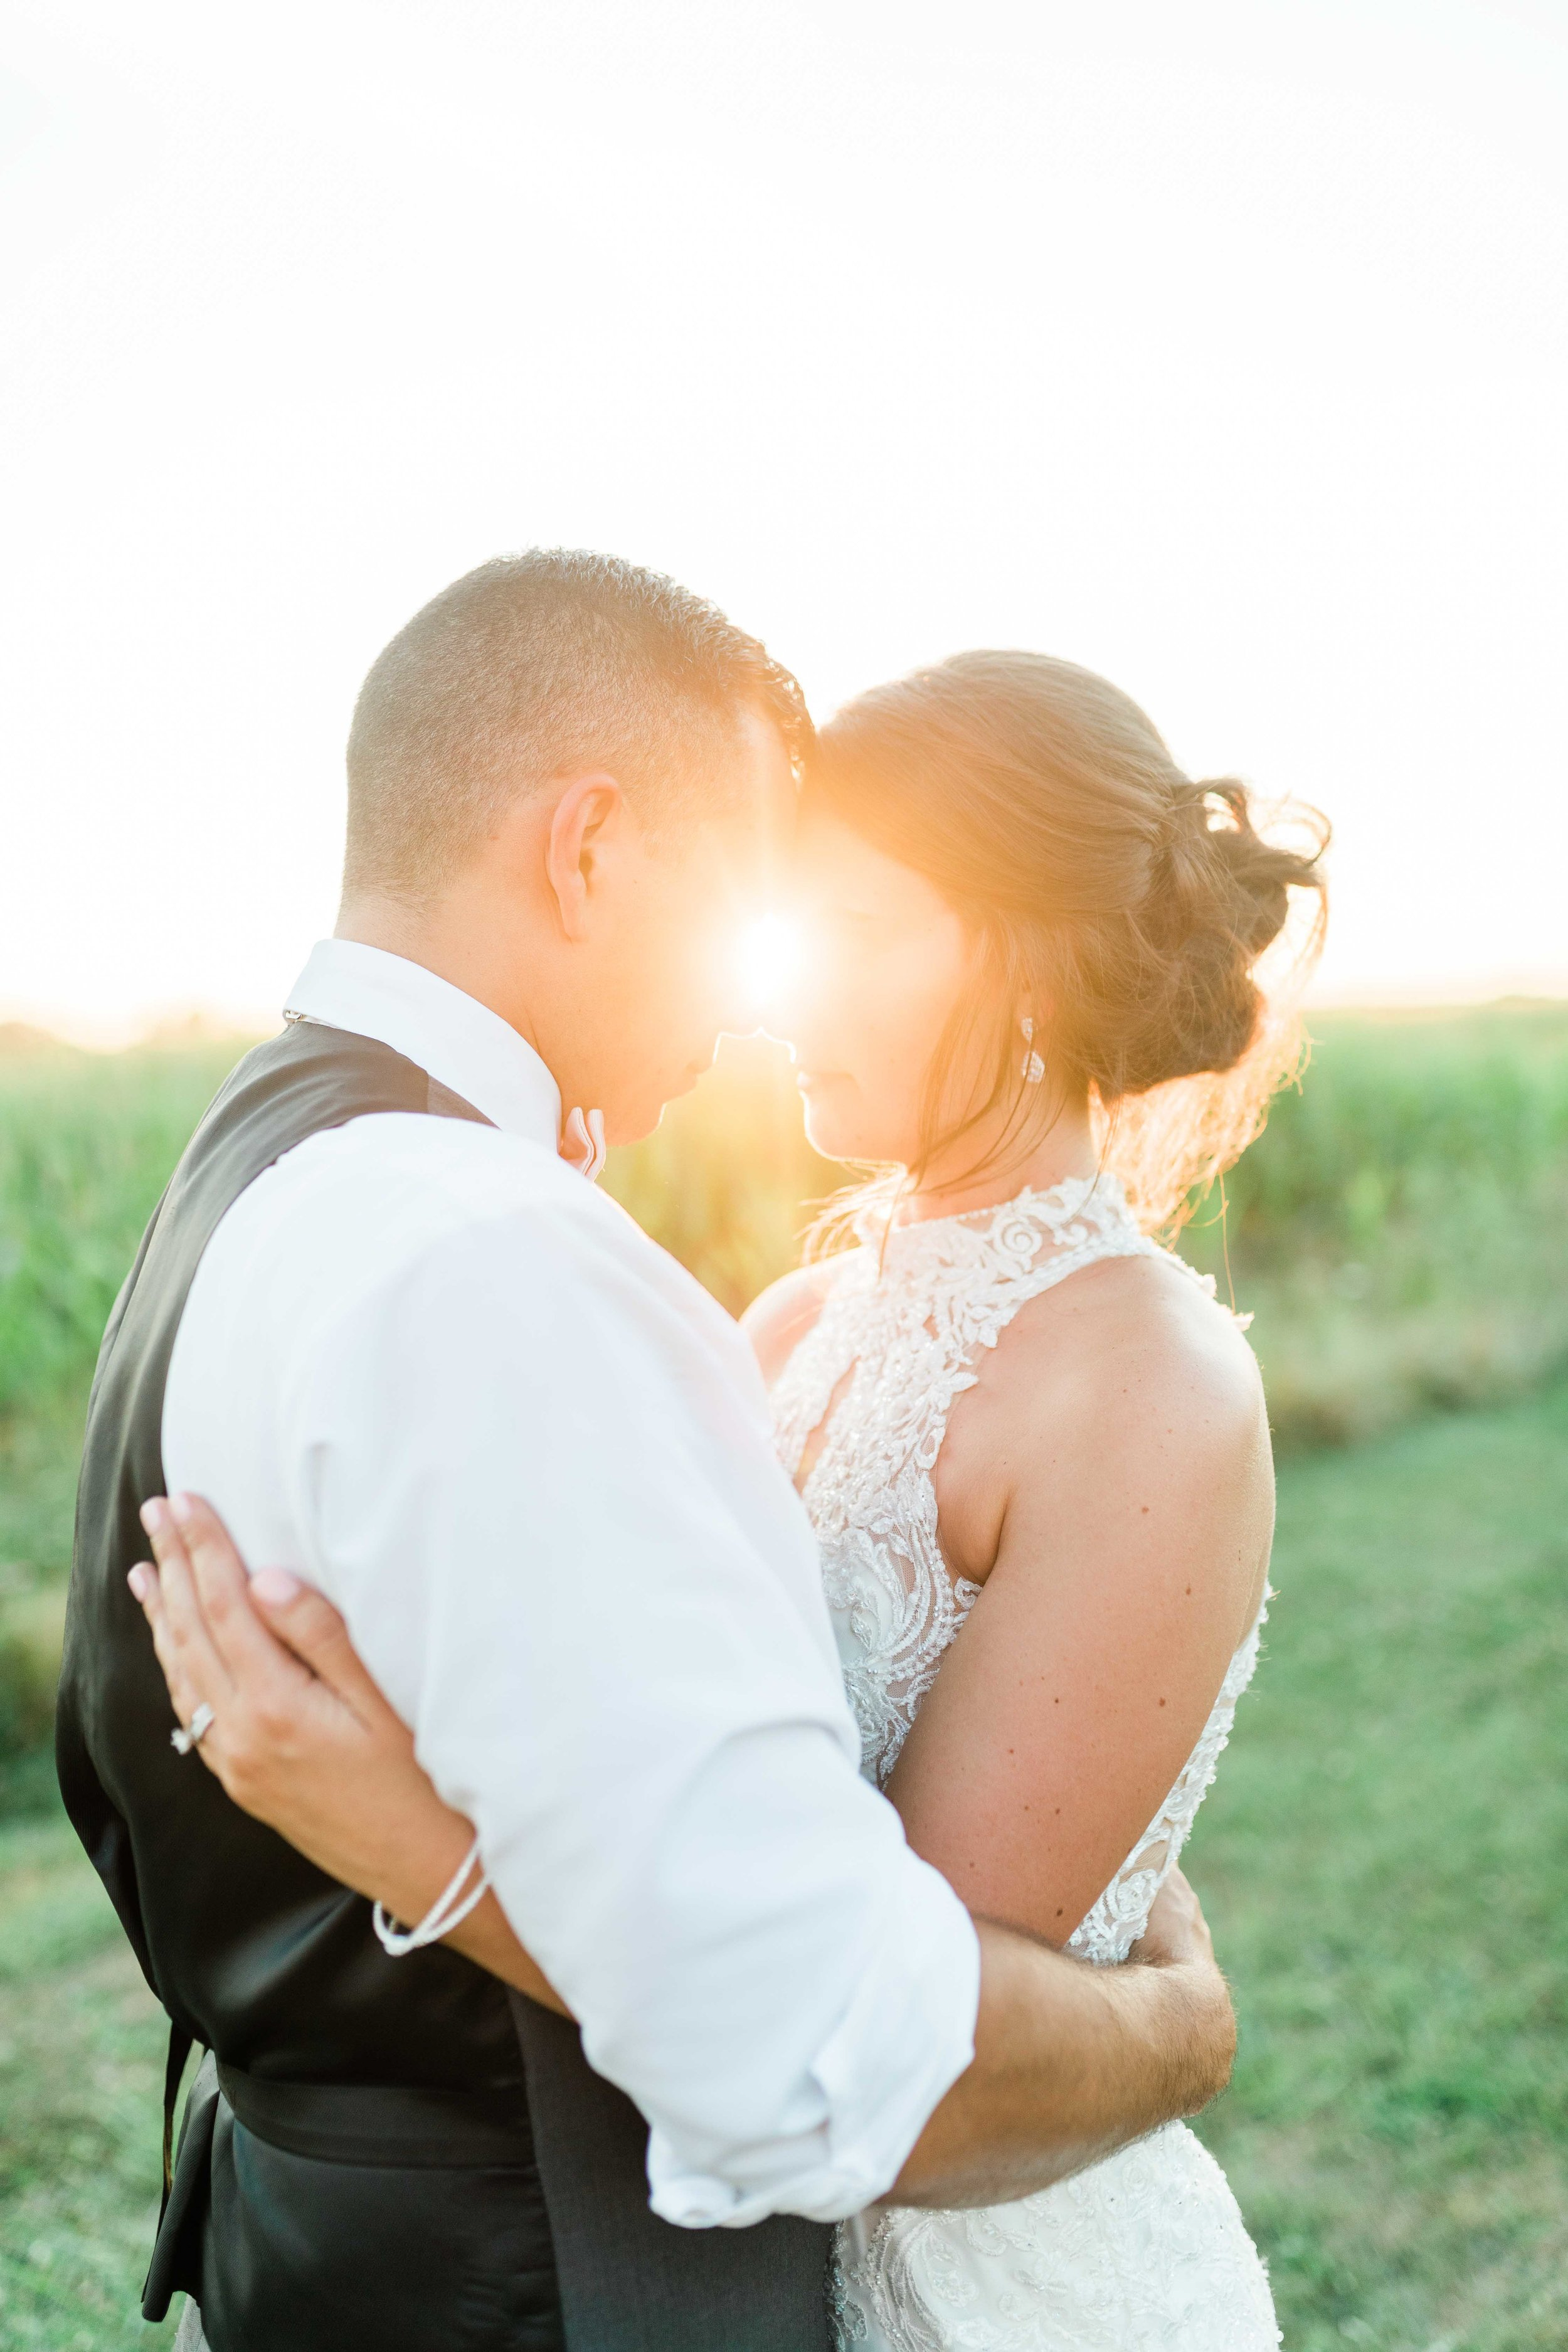 light and airy wedding photographers near me-1.jpg